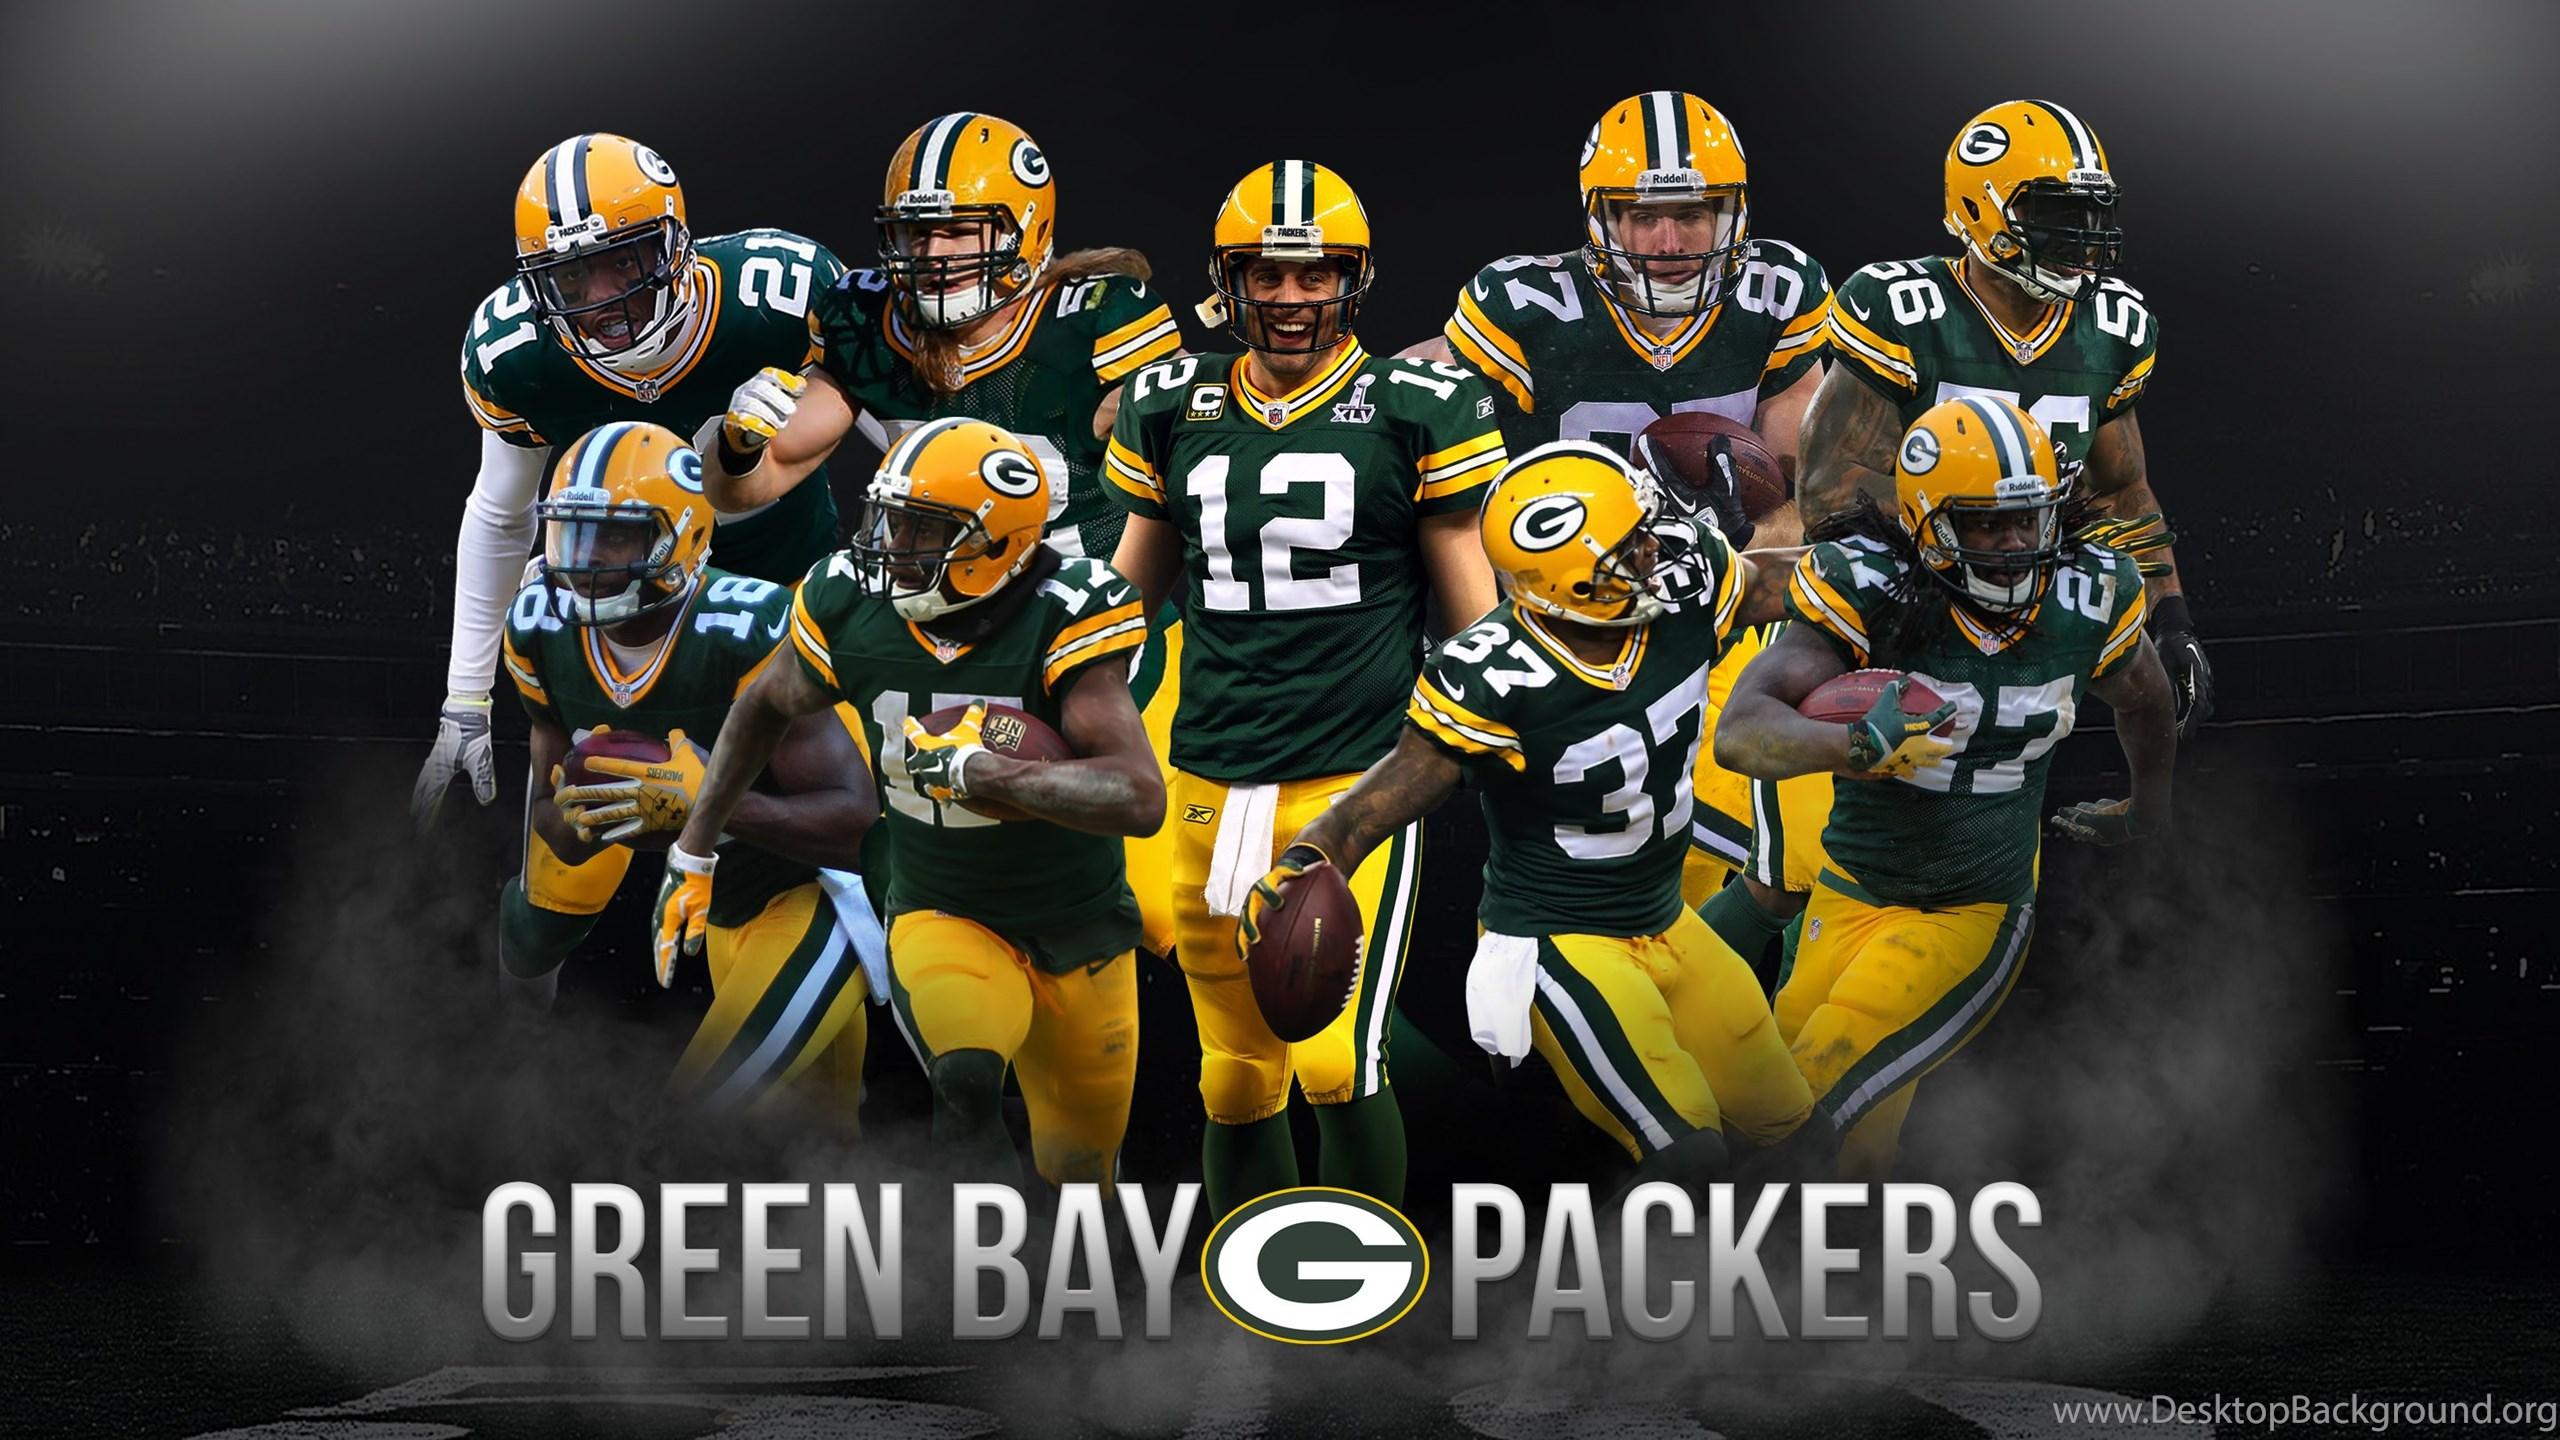 Packers Hd Wallpaper